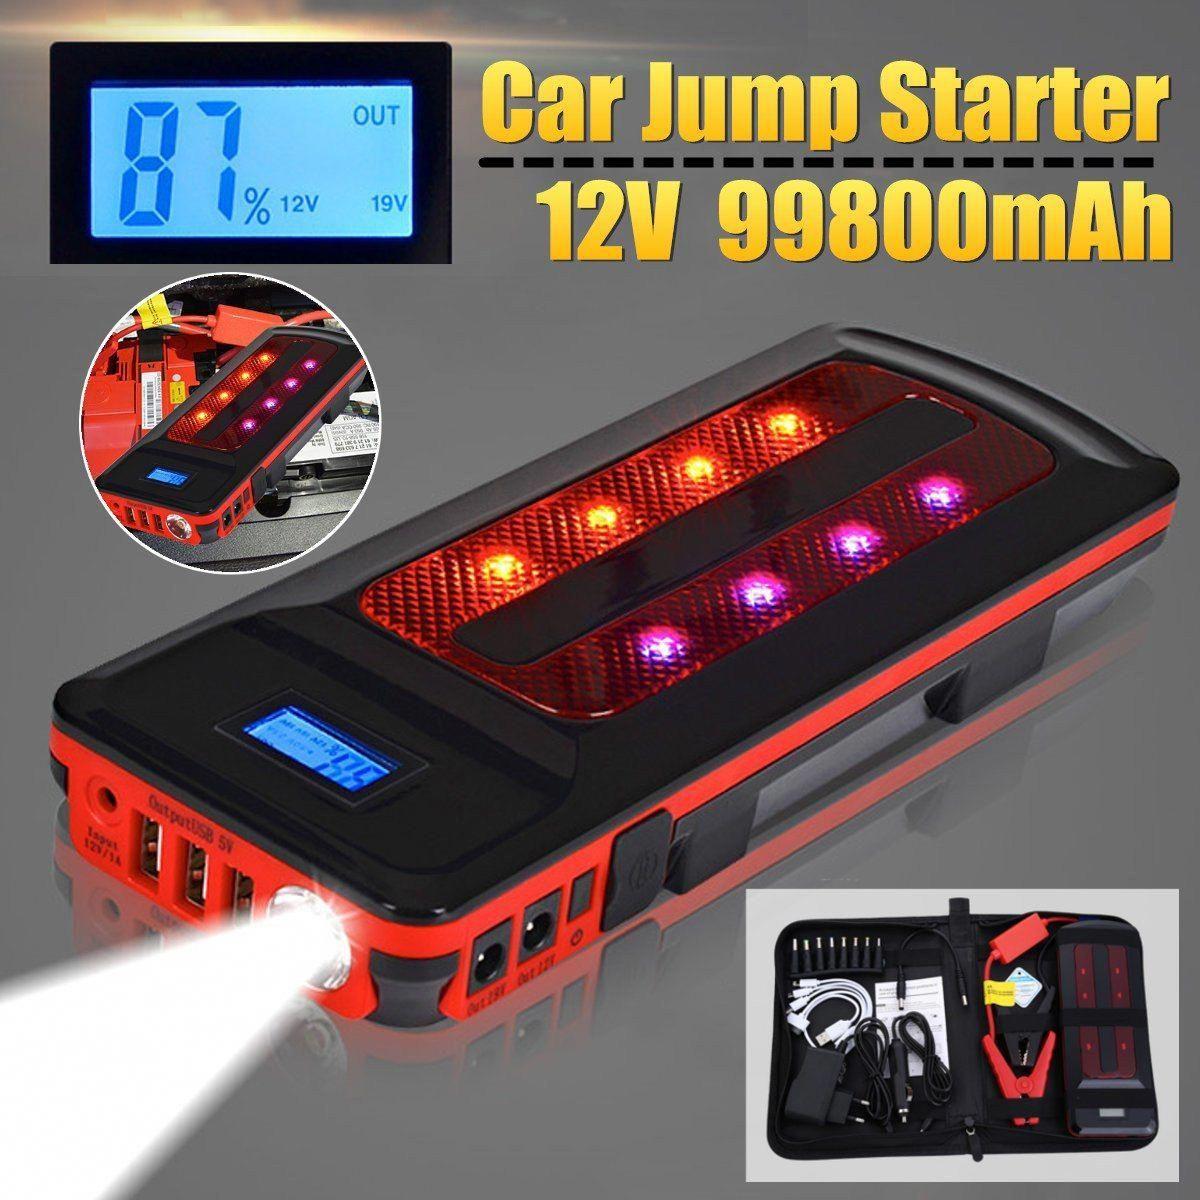 12v 99800mah Portable Emergency Battery Charger Car Jump Starter